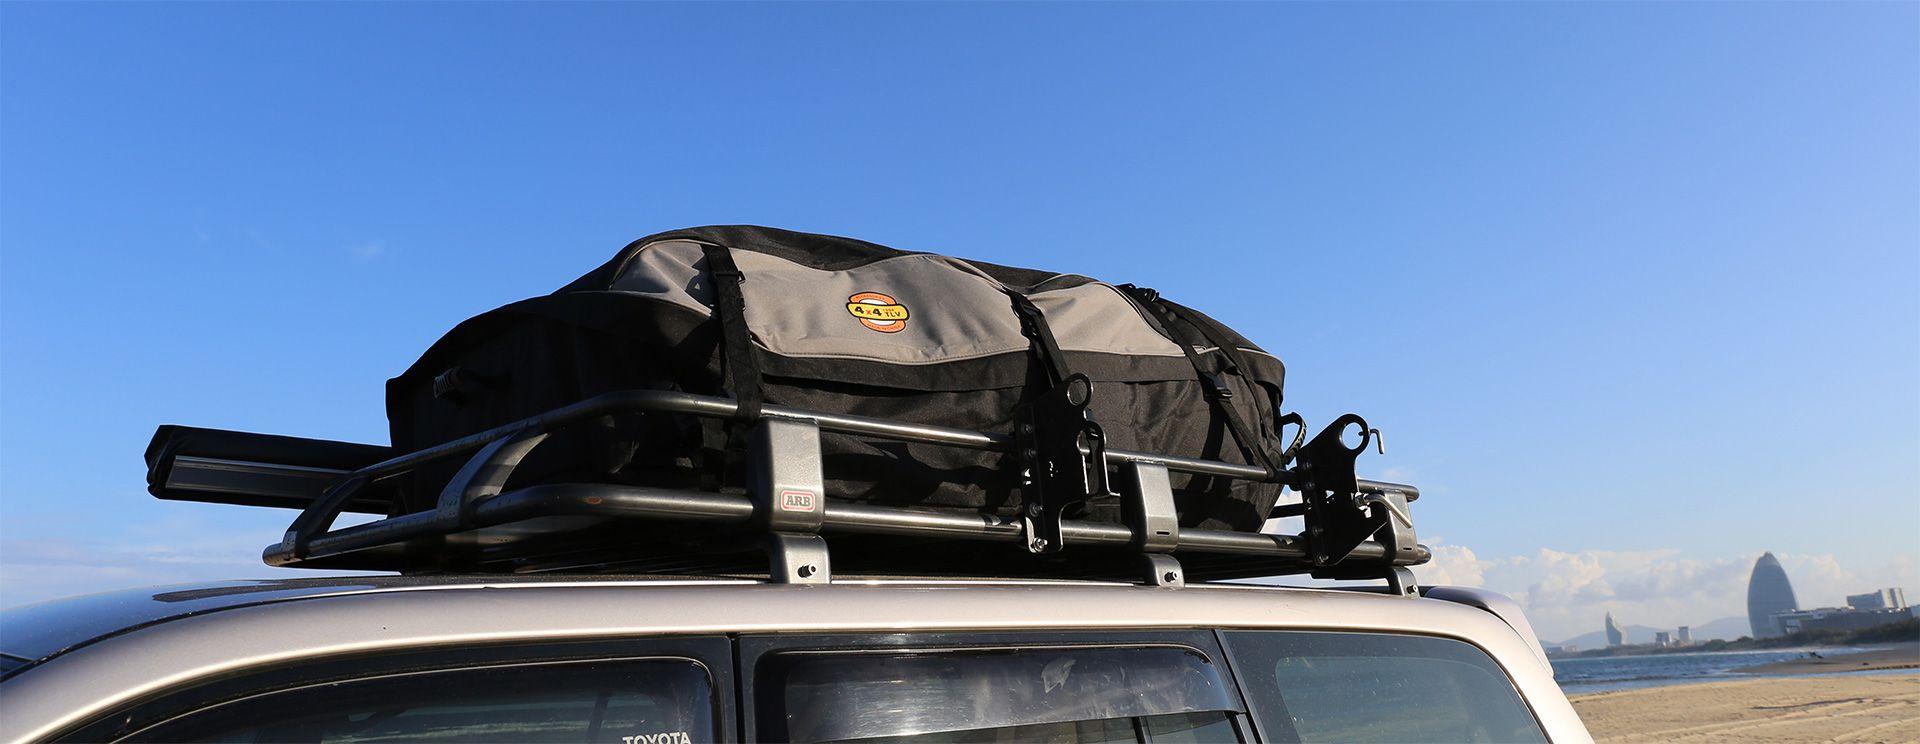 telawei 4x4 camping equipment banner